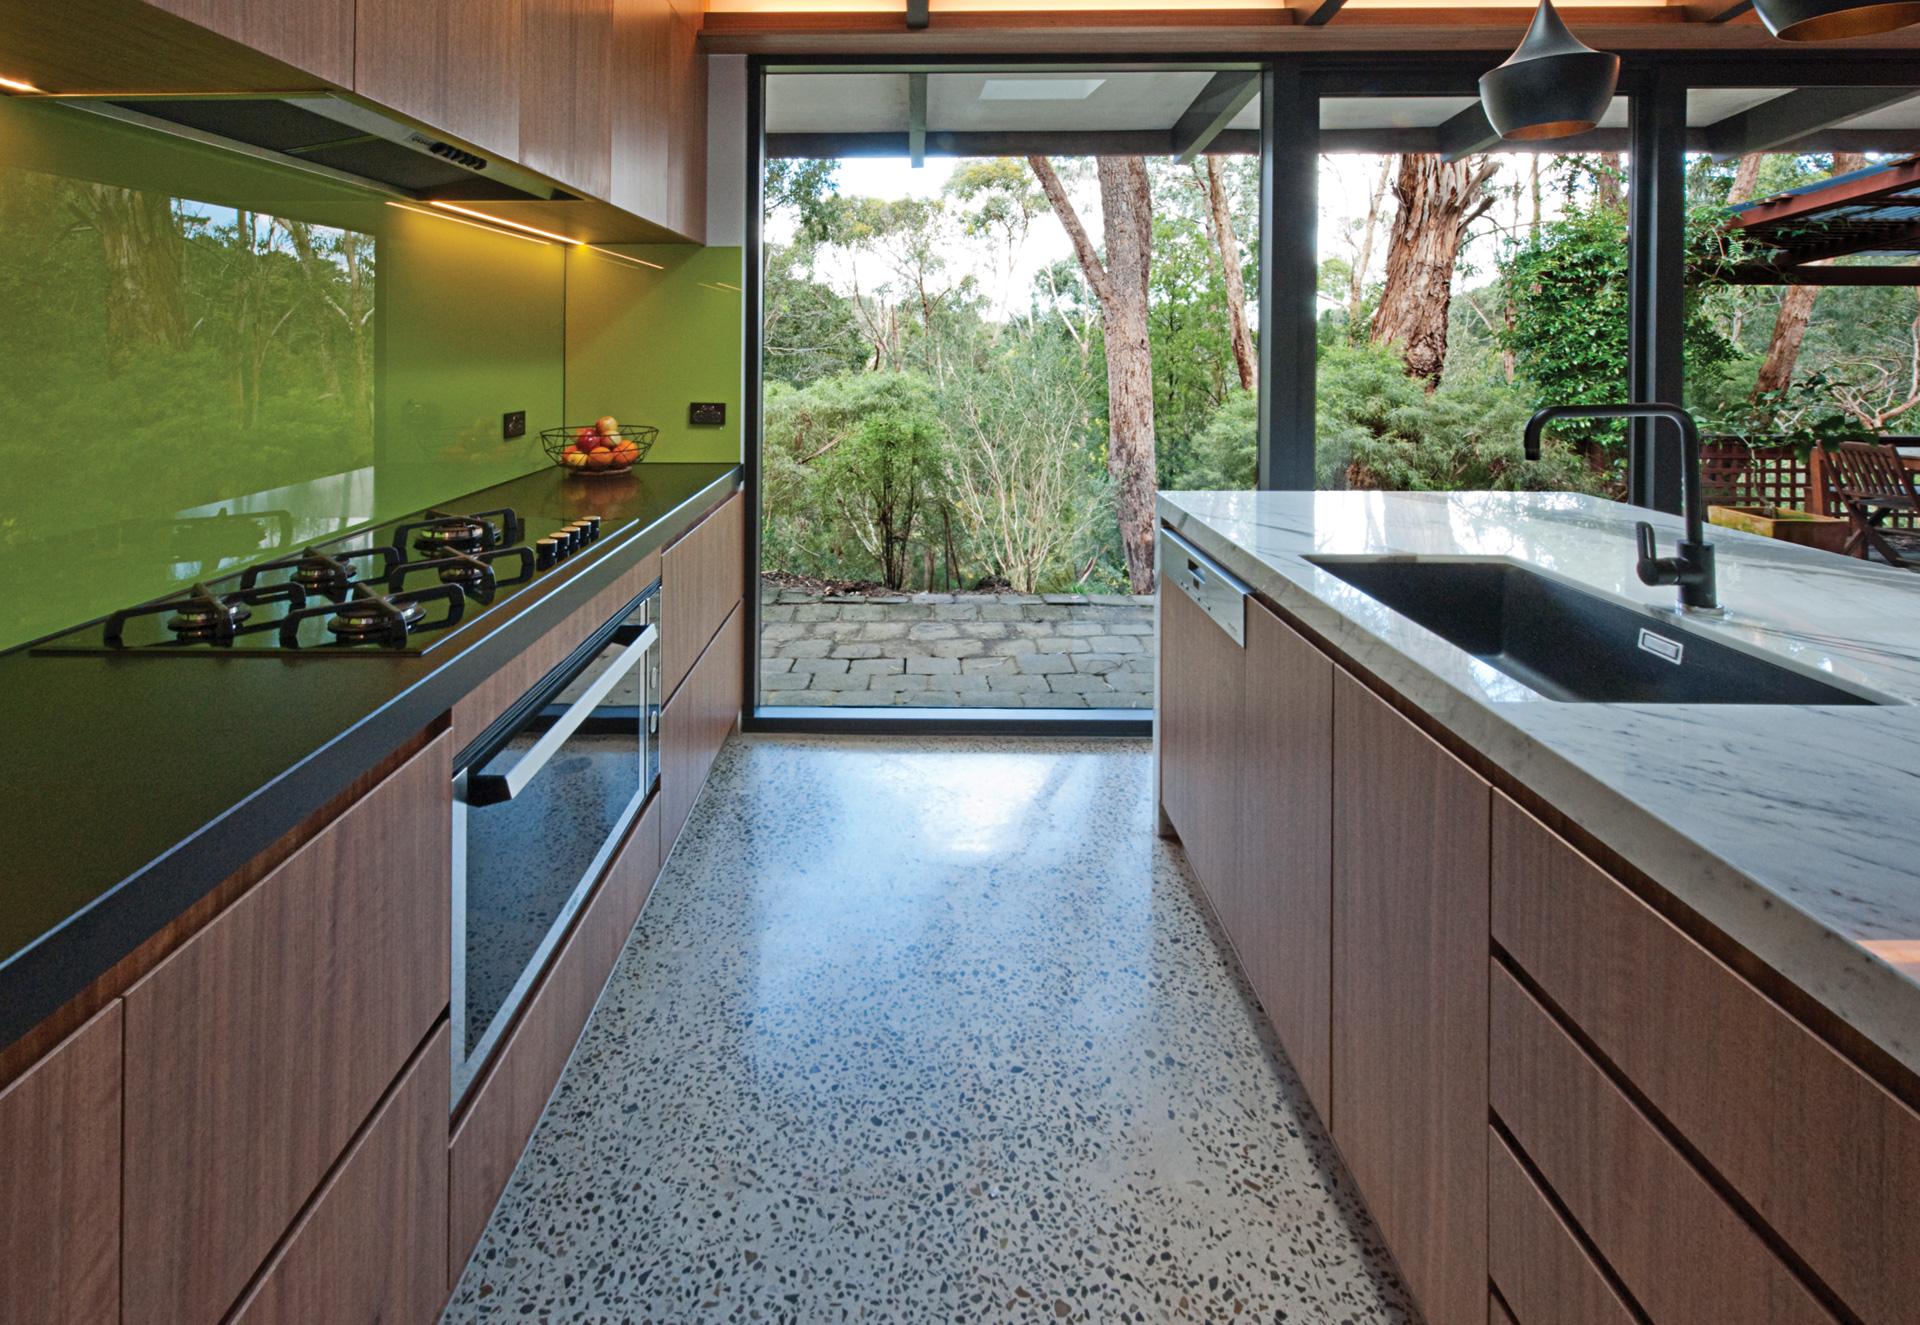 ecobuilt-kitchen-park-orchards-4